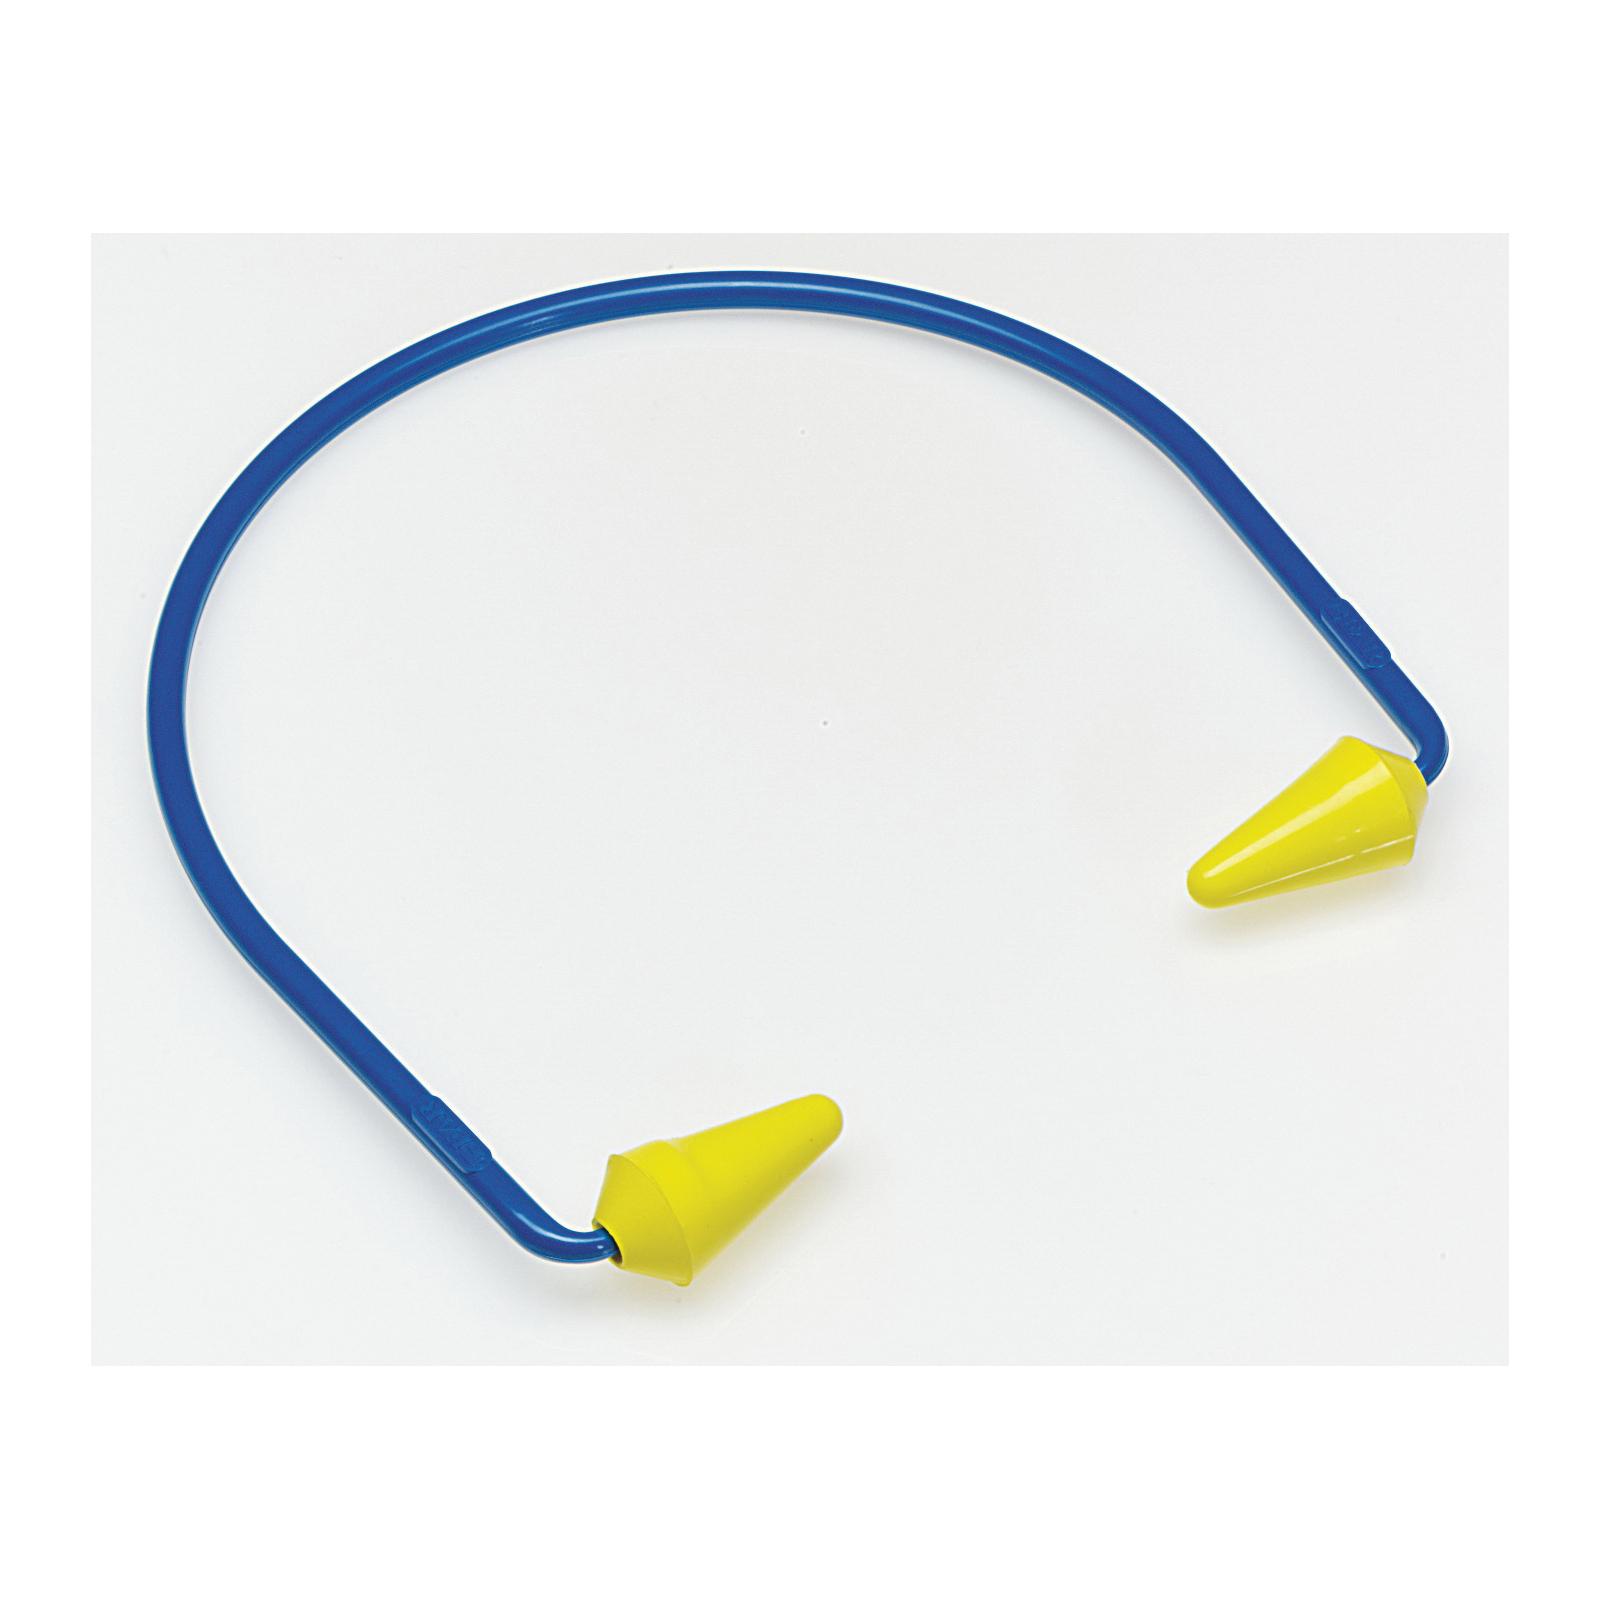 3M™ E-A-R™ Caboflex™ 080529-20000 Earplugs, 17 dB Noise Reduction, Band with Pod Shape, CSA Class AL, Reusable, Corded Design